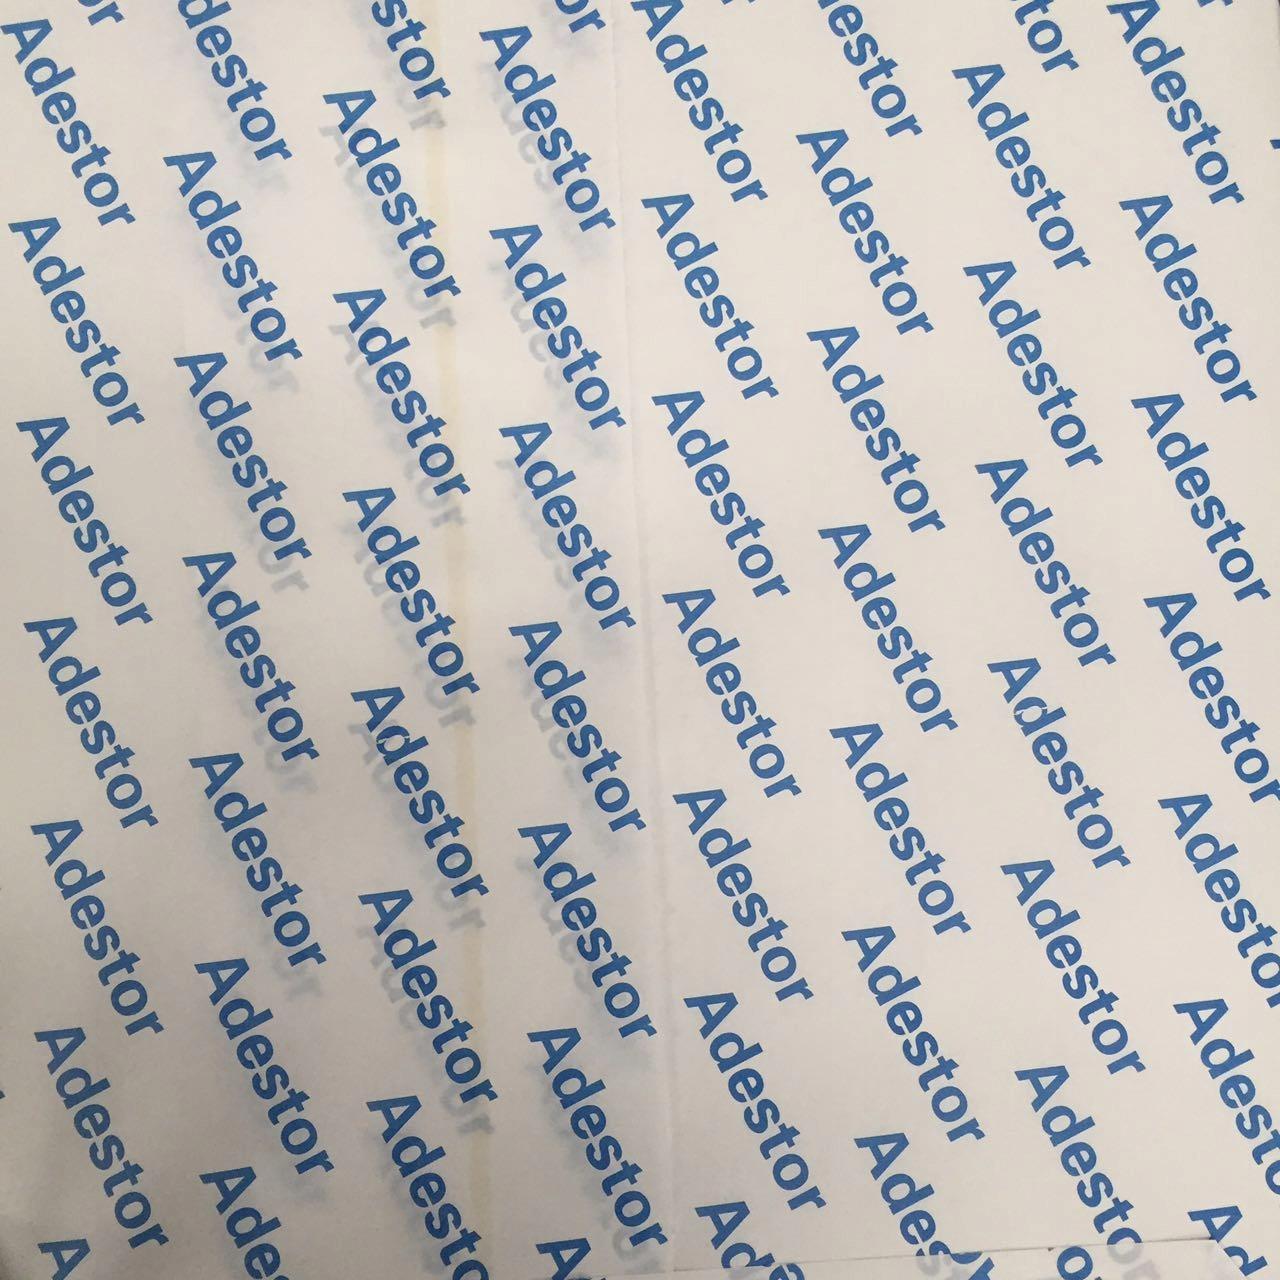 Samolepiaci papier 80g A3 100 ks